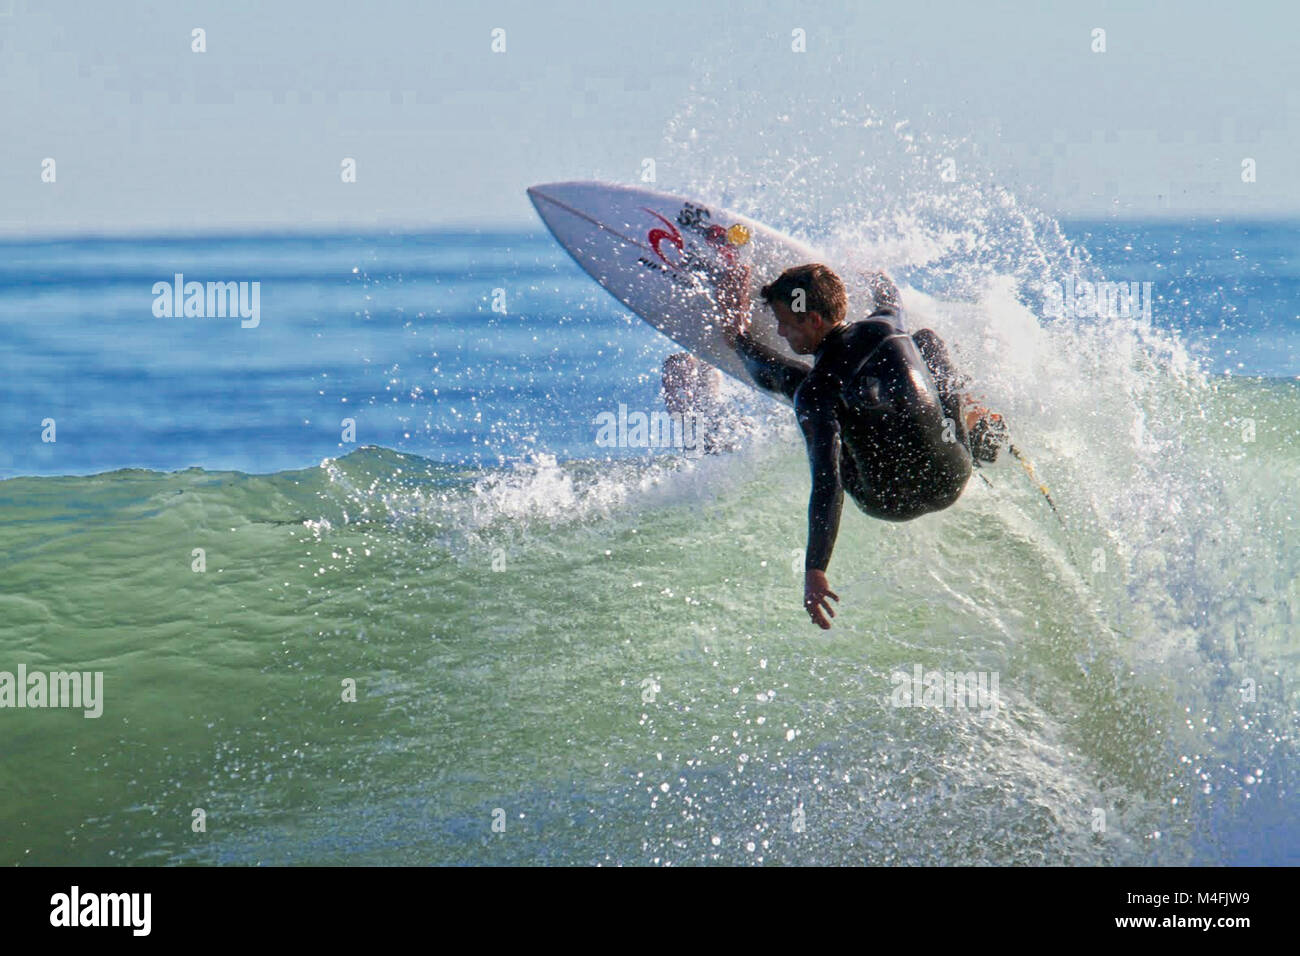 Surfing Rincon California - Stock Image